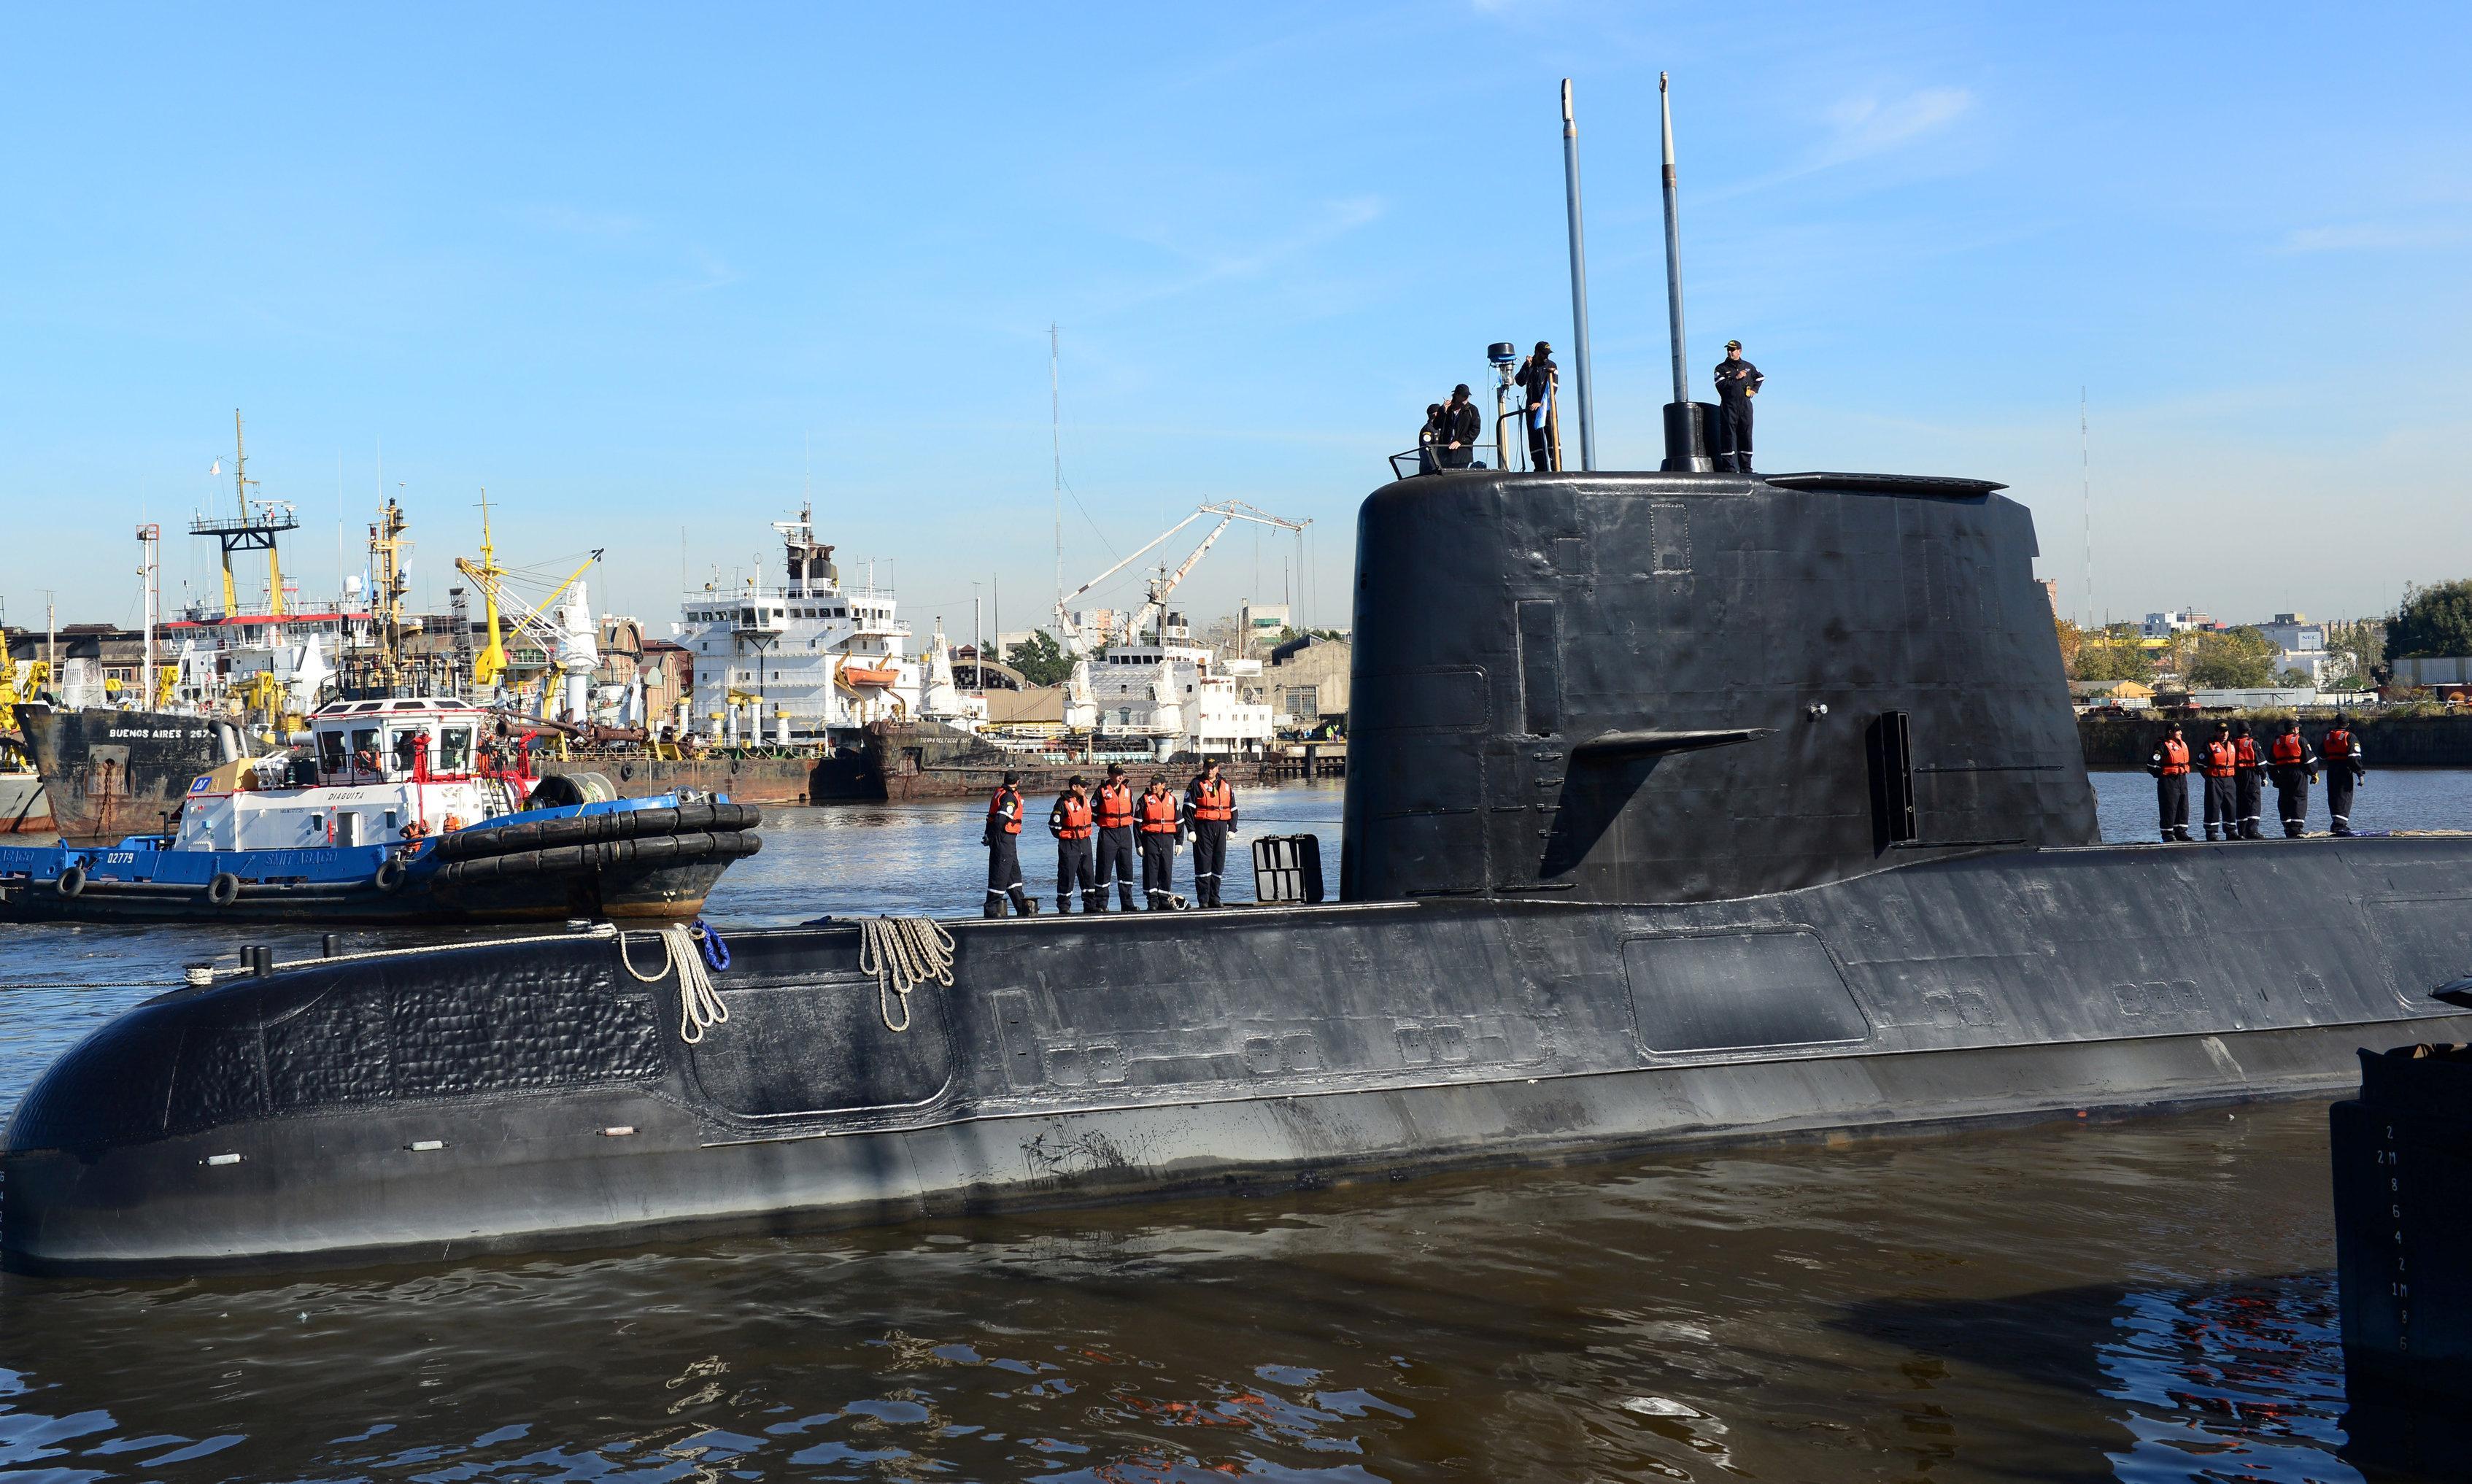 Submarine that vanished with 44 crew is found sunken in Atlantic